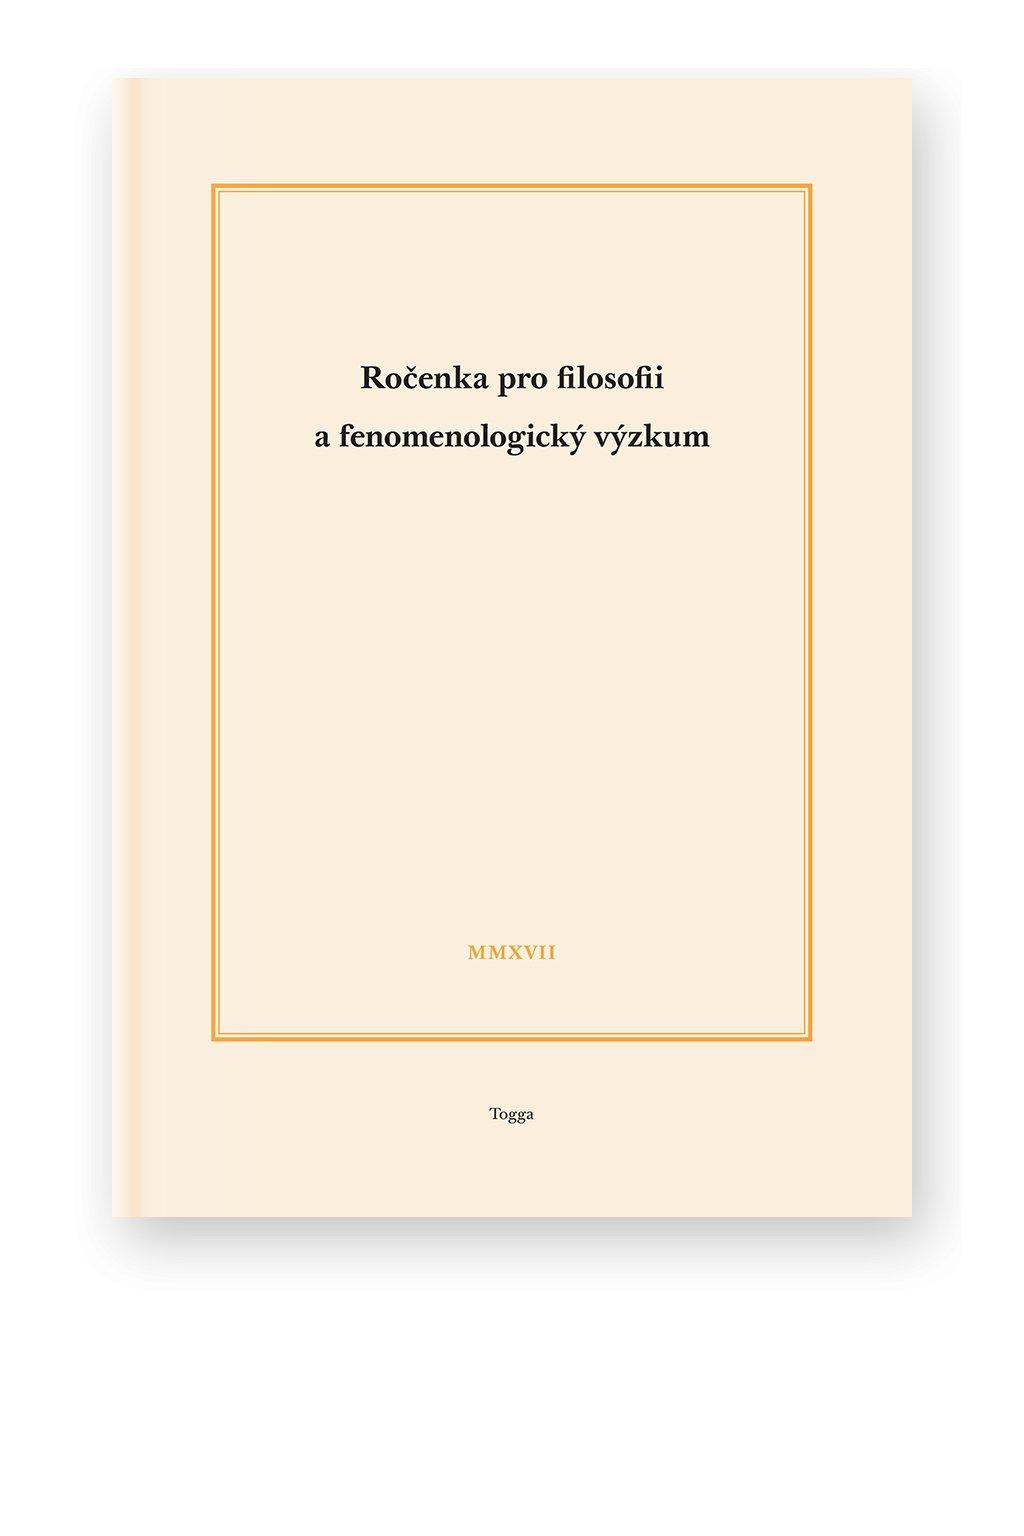 1203 rocenka pro filosofii a fenomenologicky vyzkum 2017